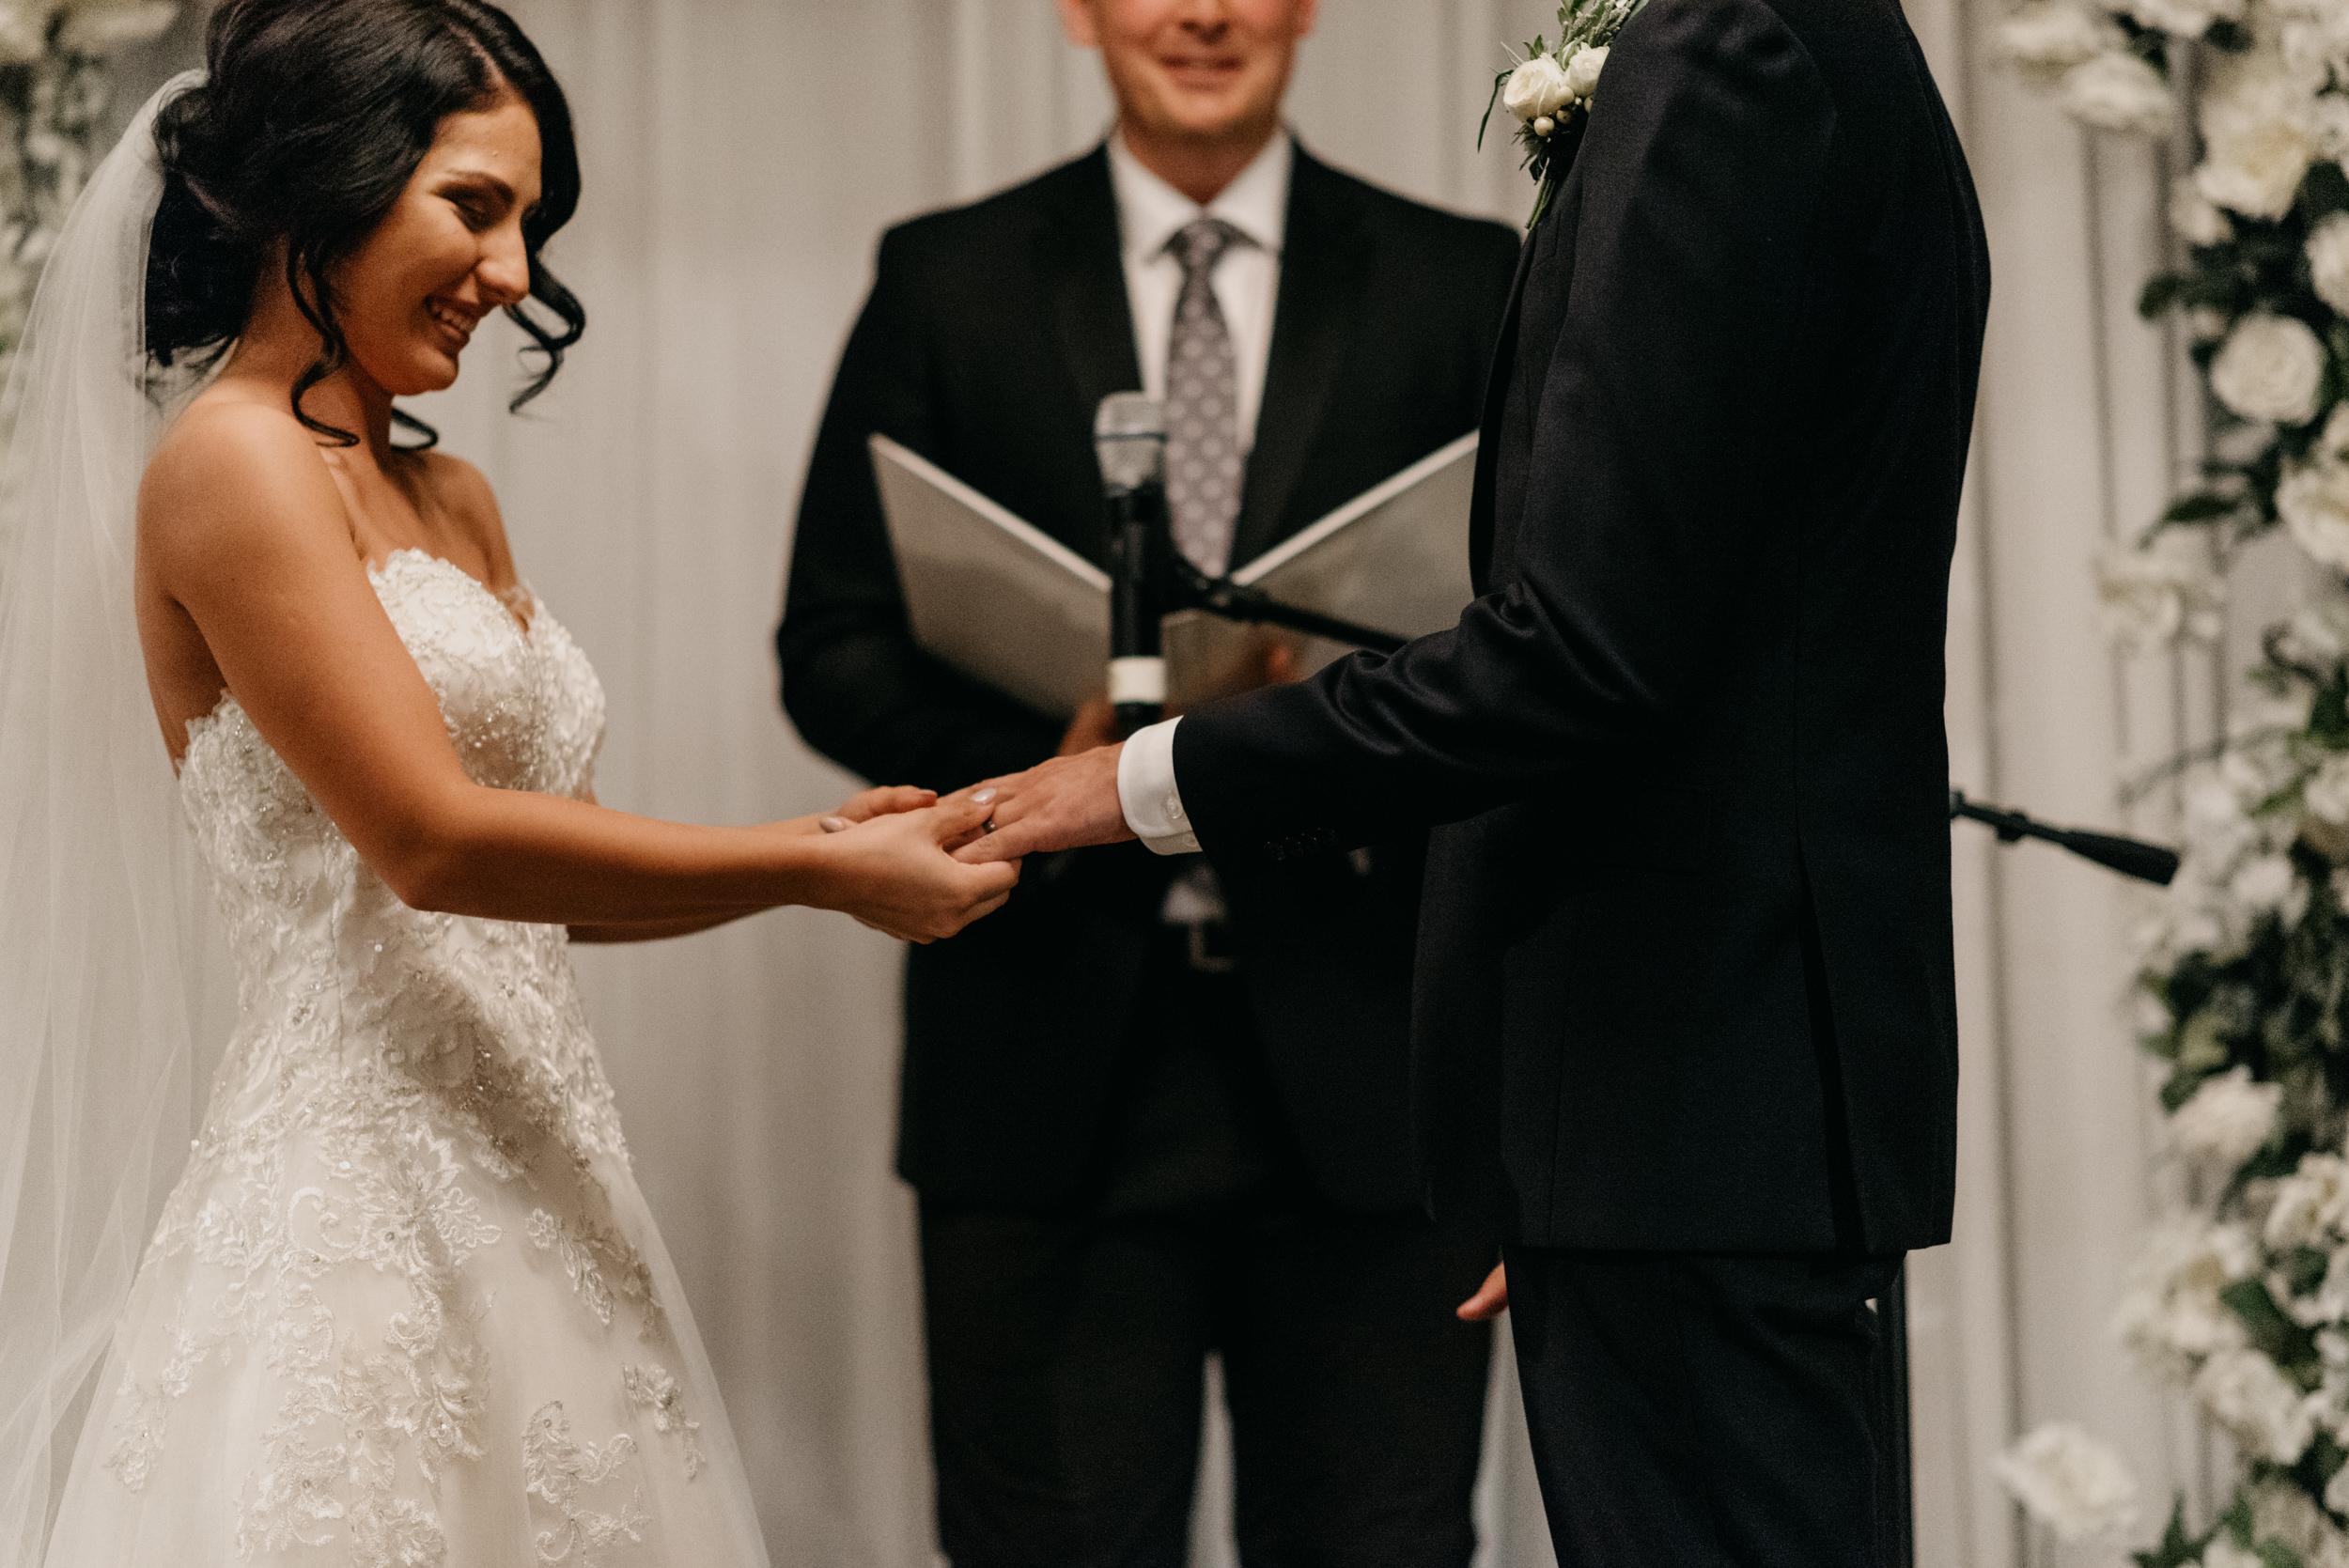 91-ceremony-west-end-ballroom-portland-wedding-venue-9238.jpg